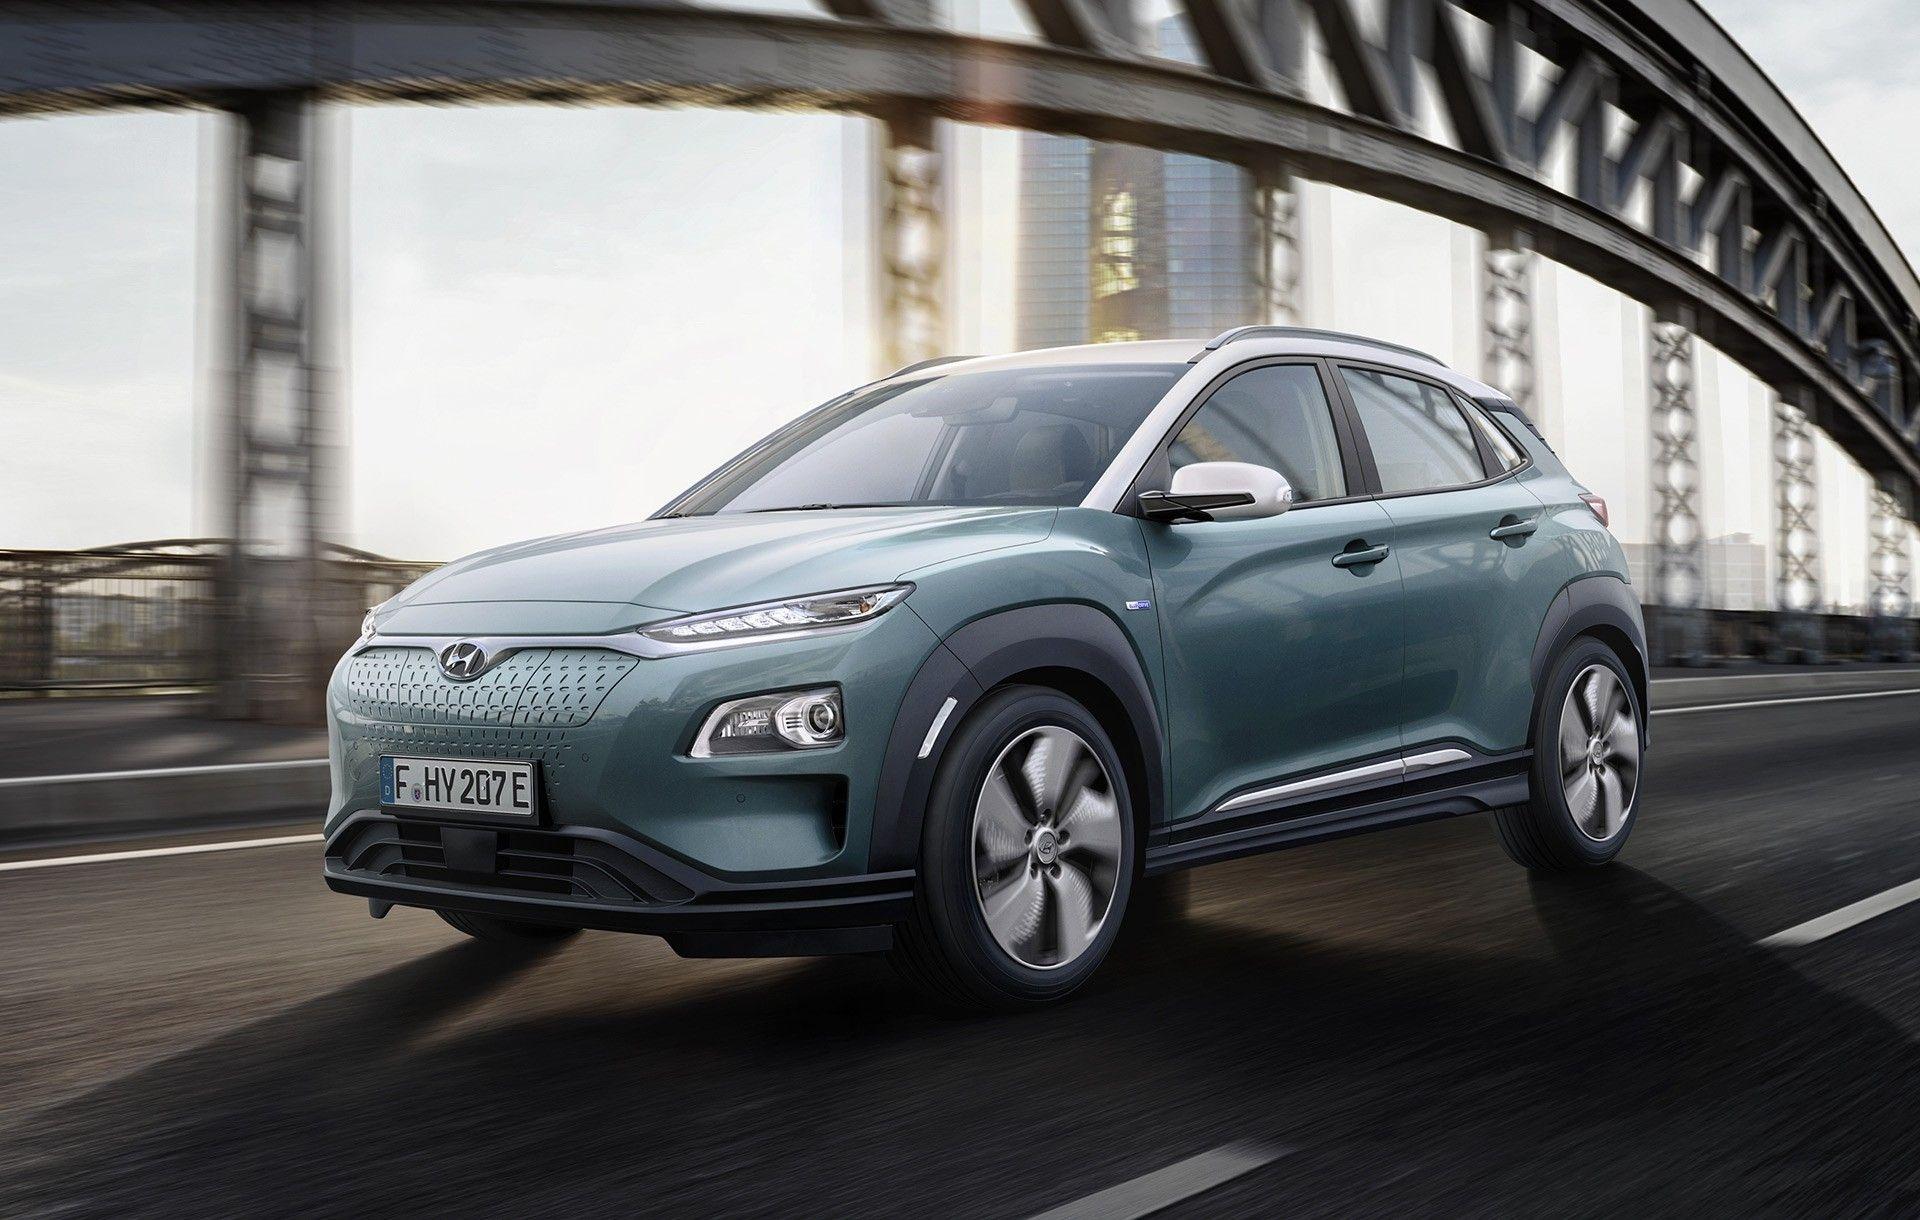 2019 hyundai hybrid concept my car review pinterest cars rh pinterest com